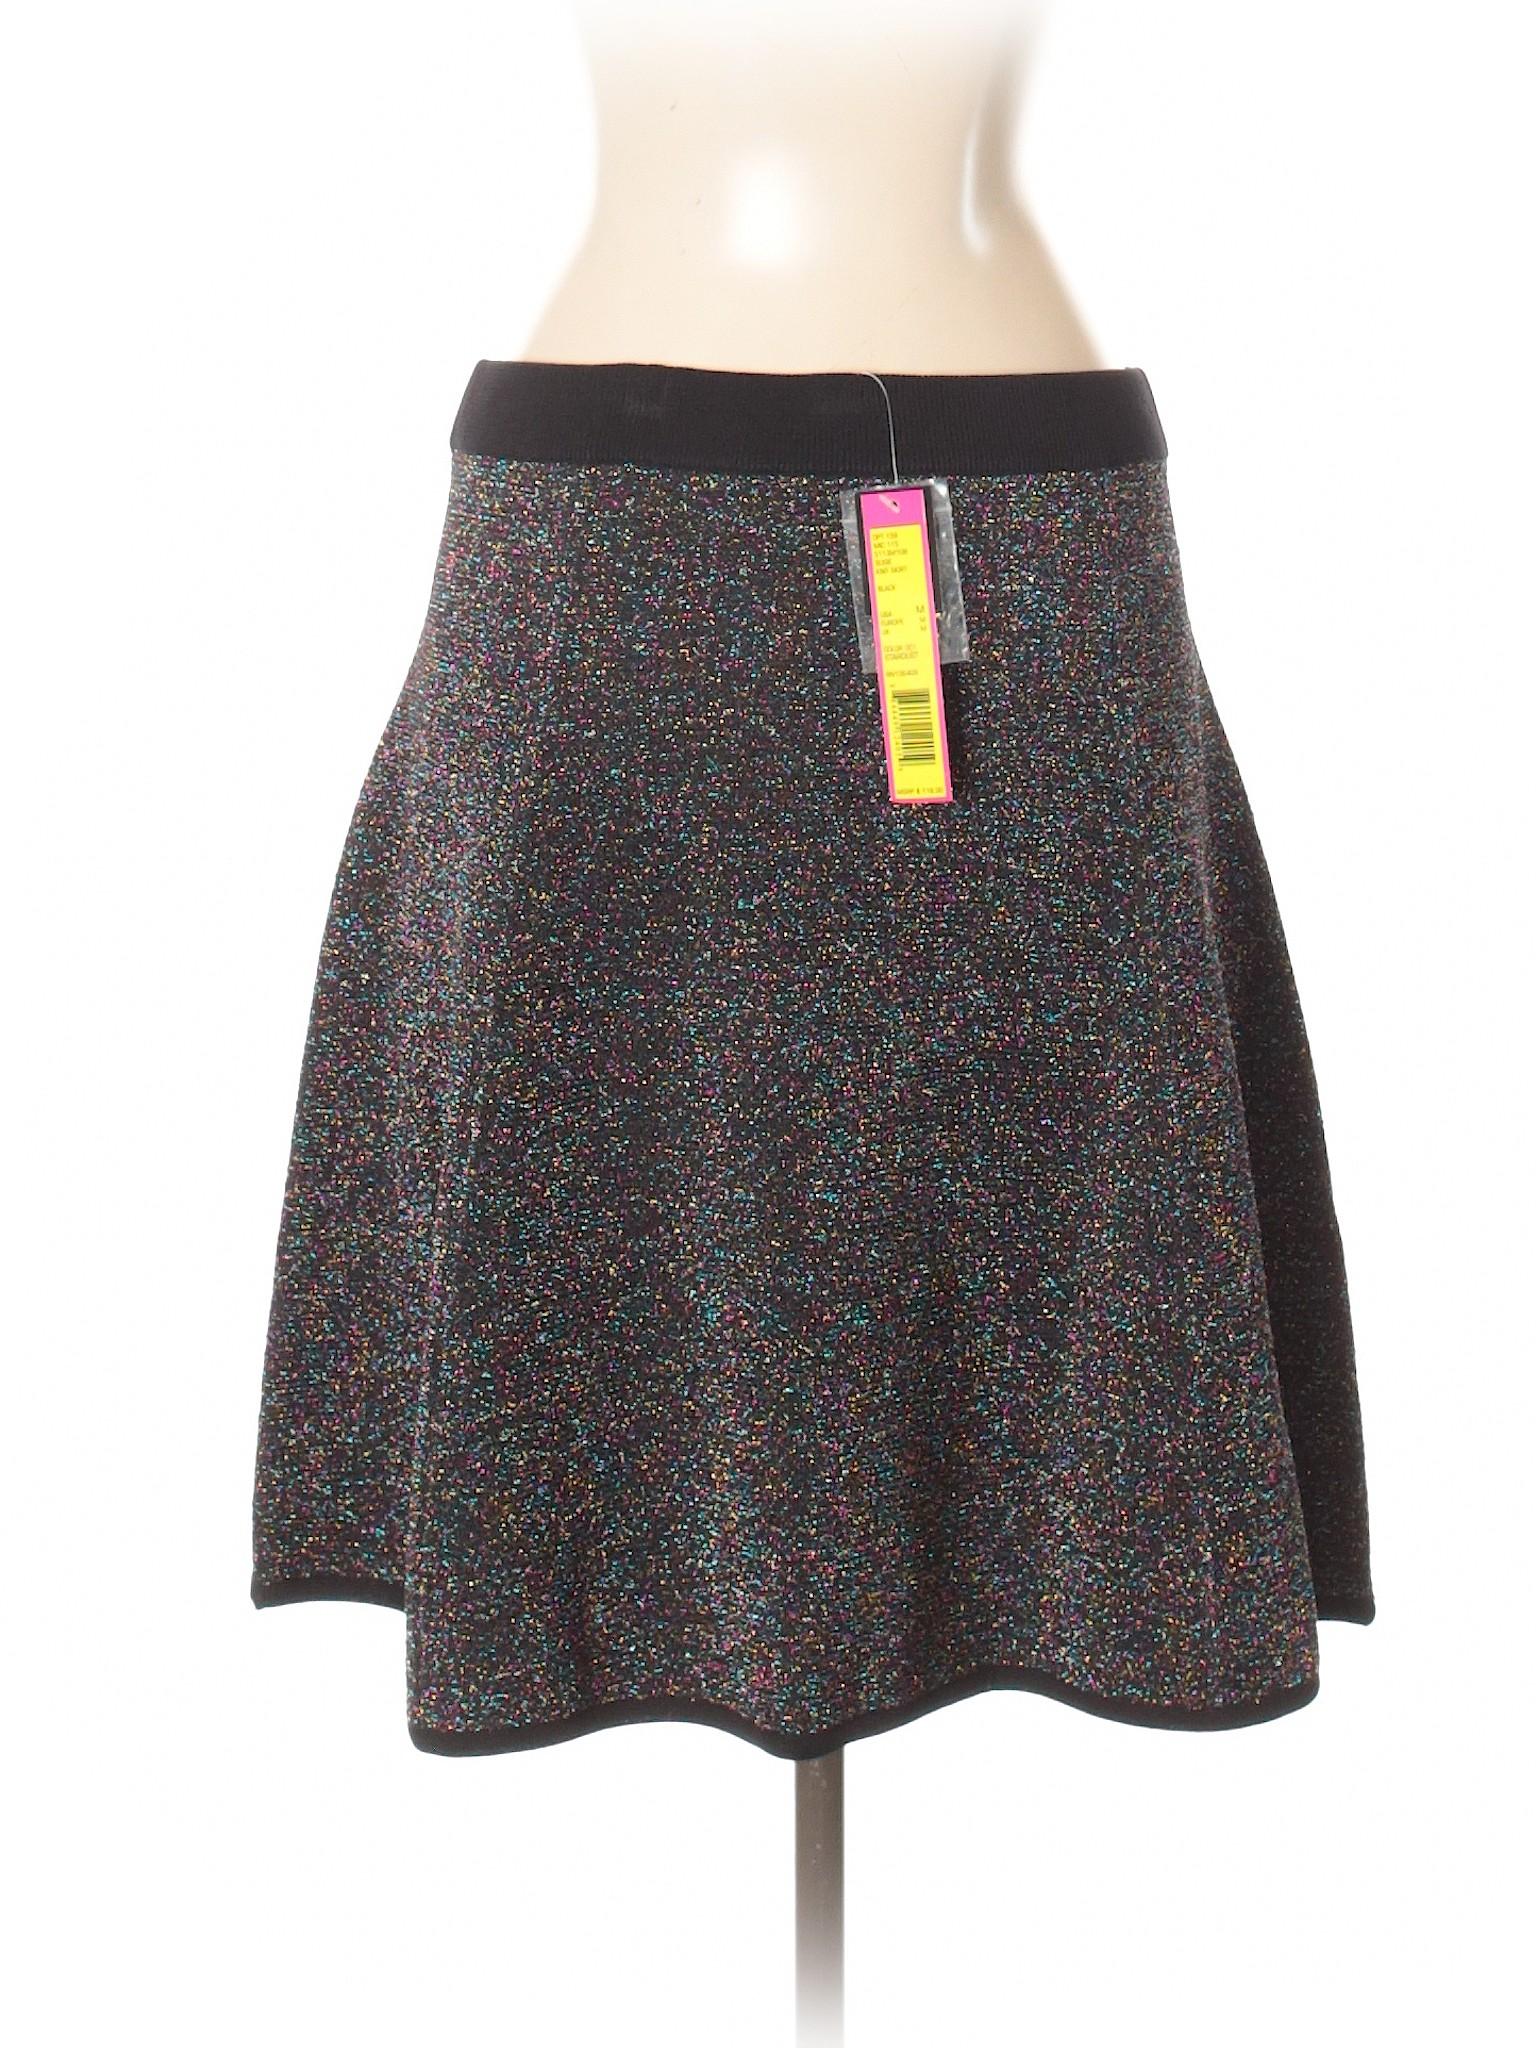 Boutique Casual Skirt Boutique Skirt Skirt Boutique Casual Casual BtP8S8